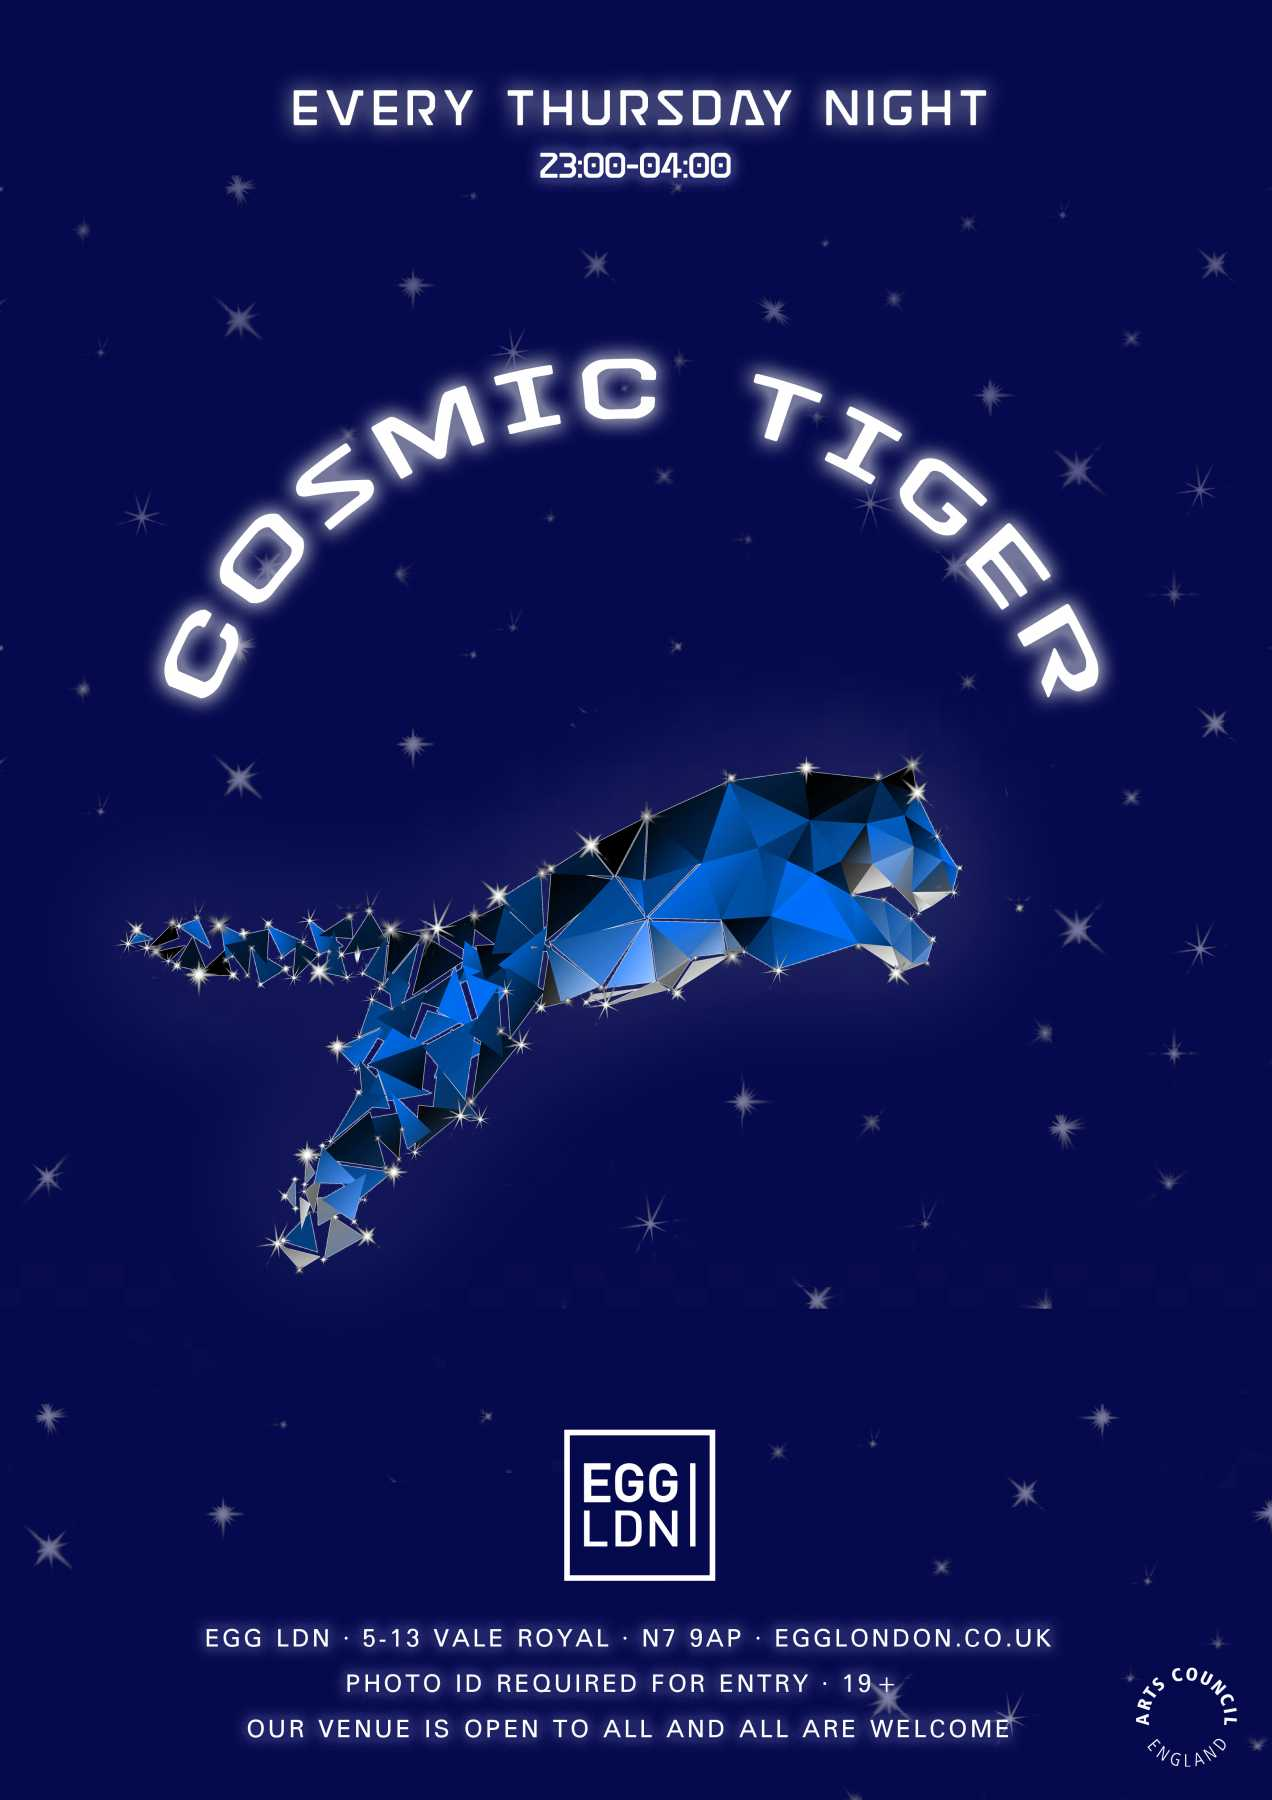 Cosmic Tiger nogenre